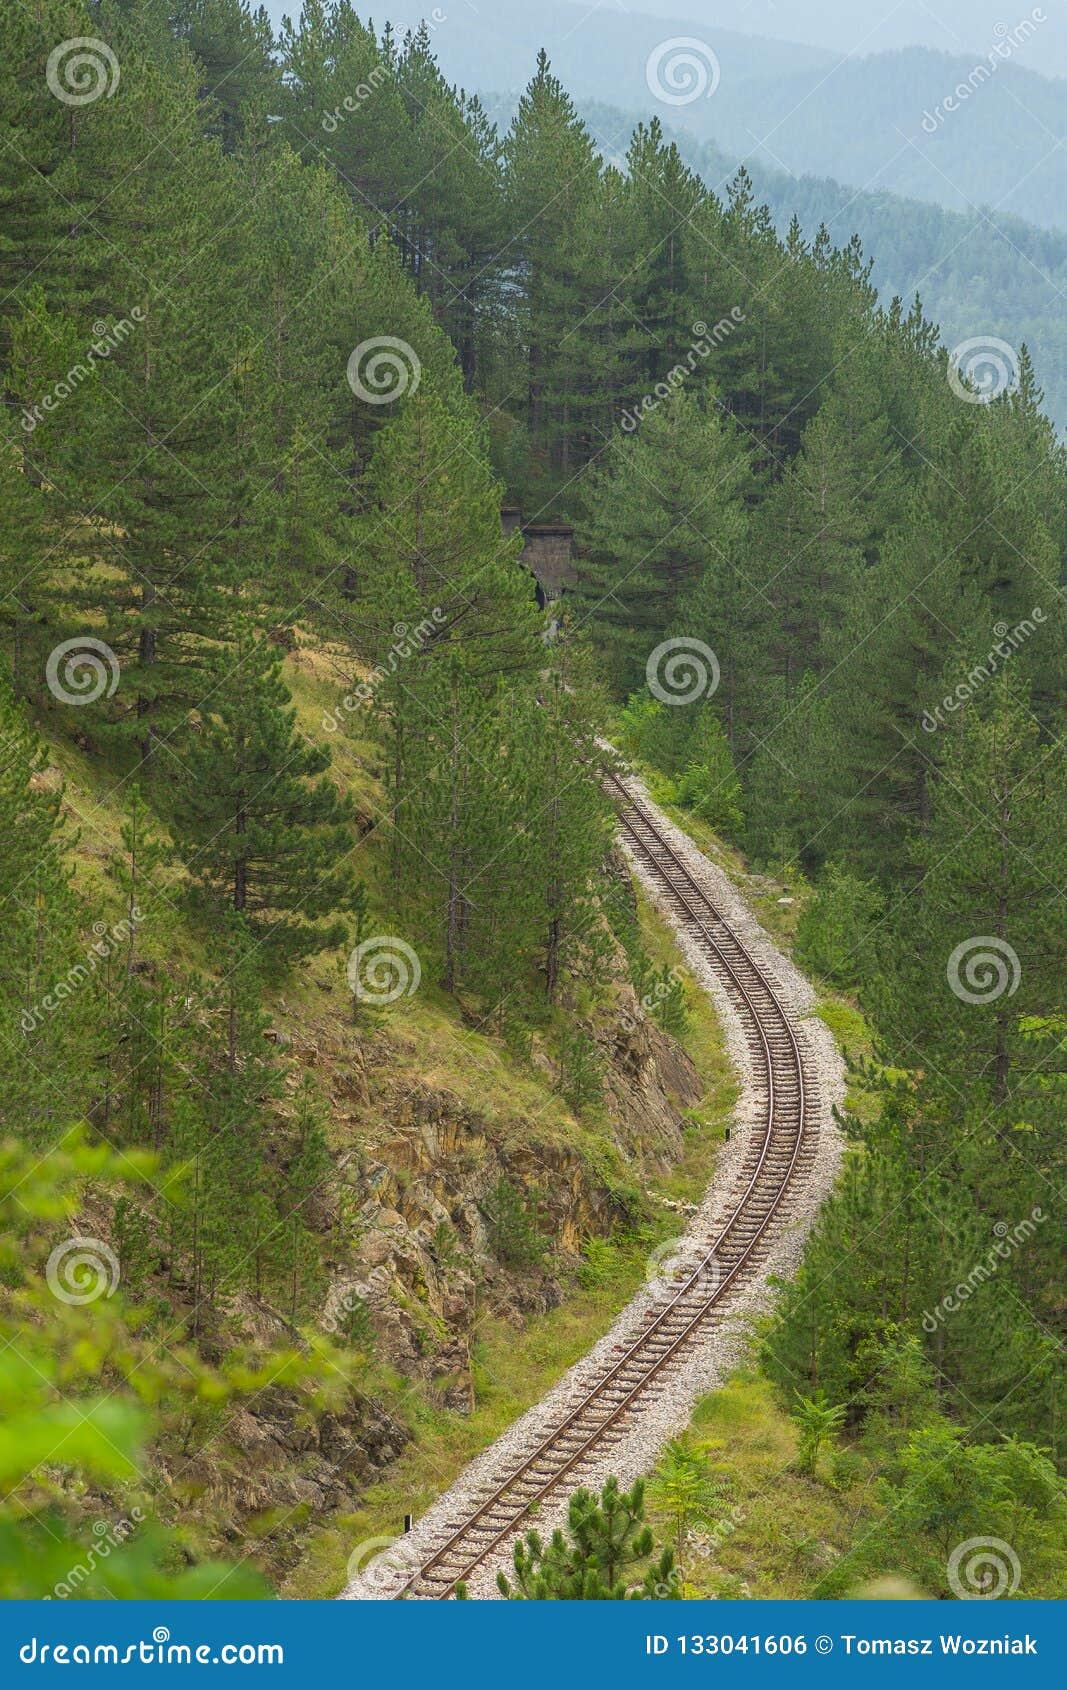 Kolej Sharganska Osmica między Mokra Gora i Sargan Vitasi, Serbia